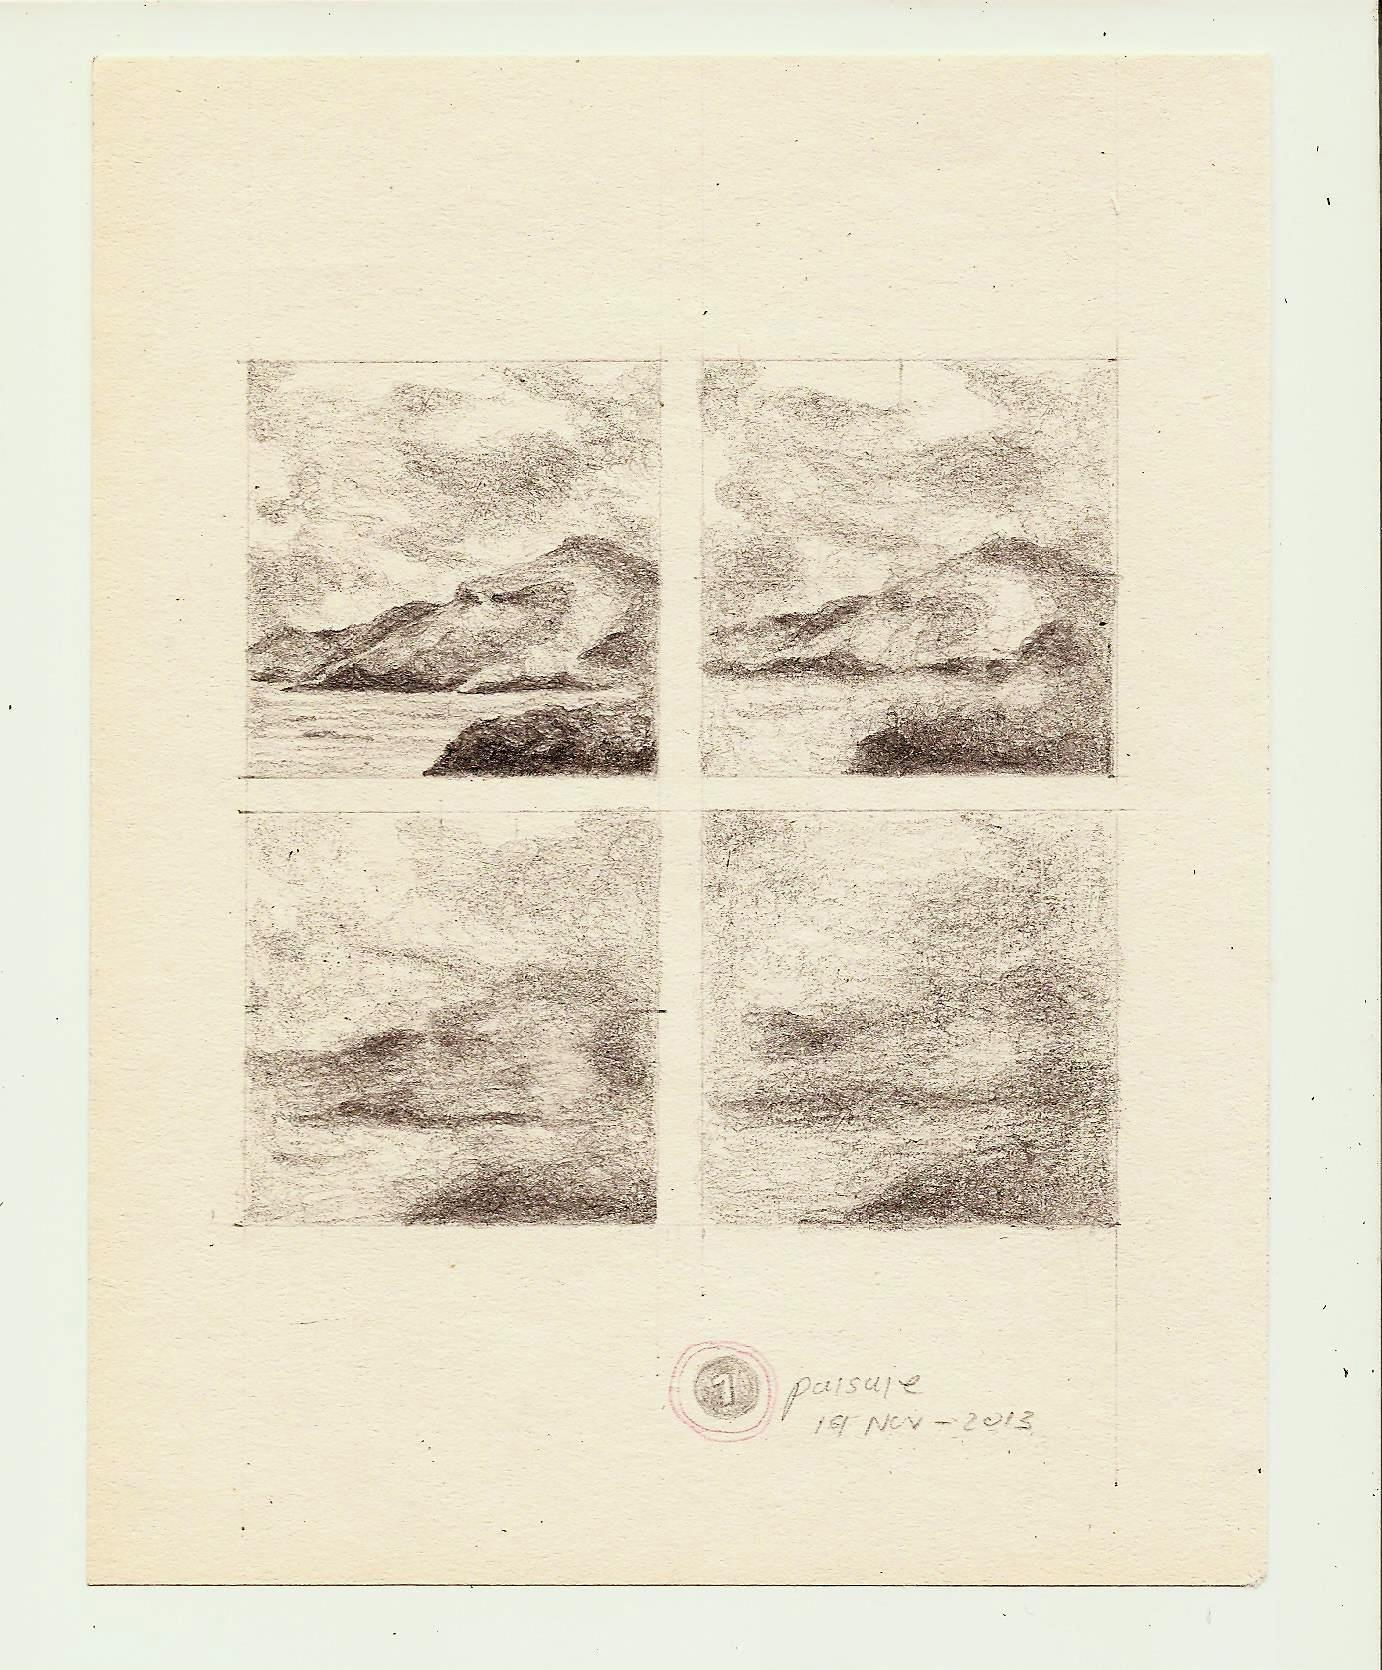 paisaje juan carlos osorno grafito sobre papel 2013